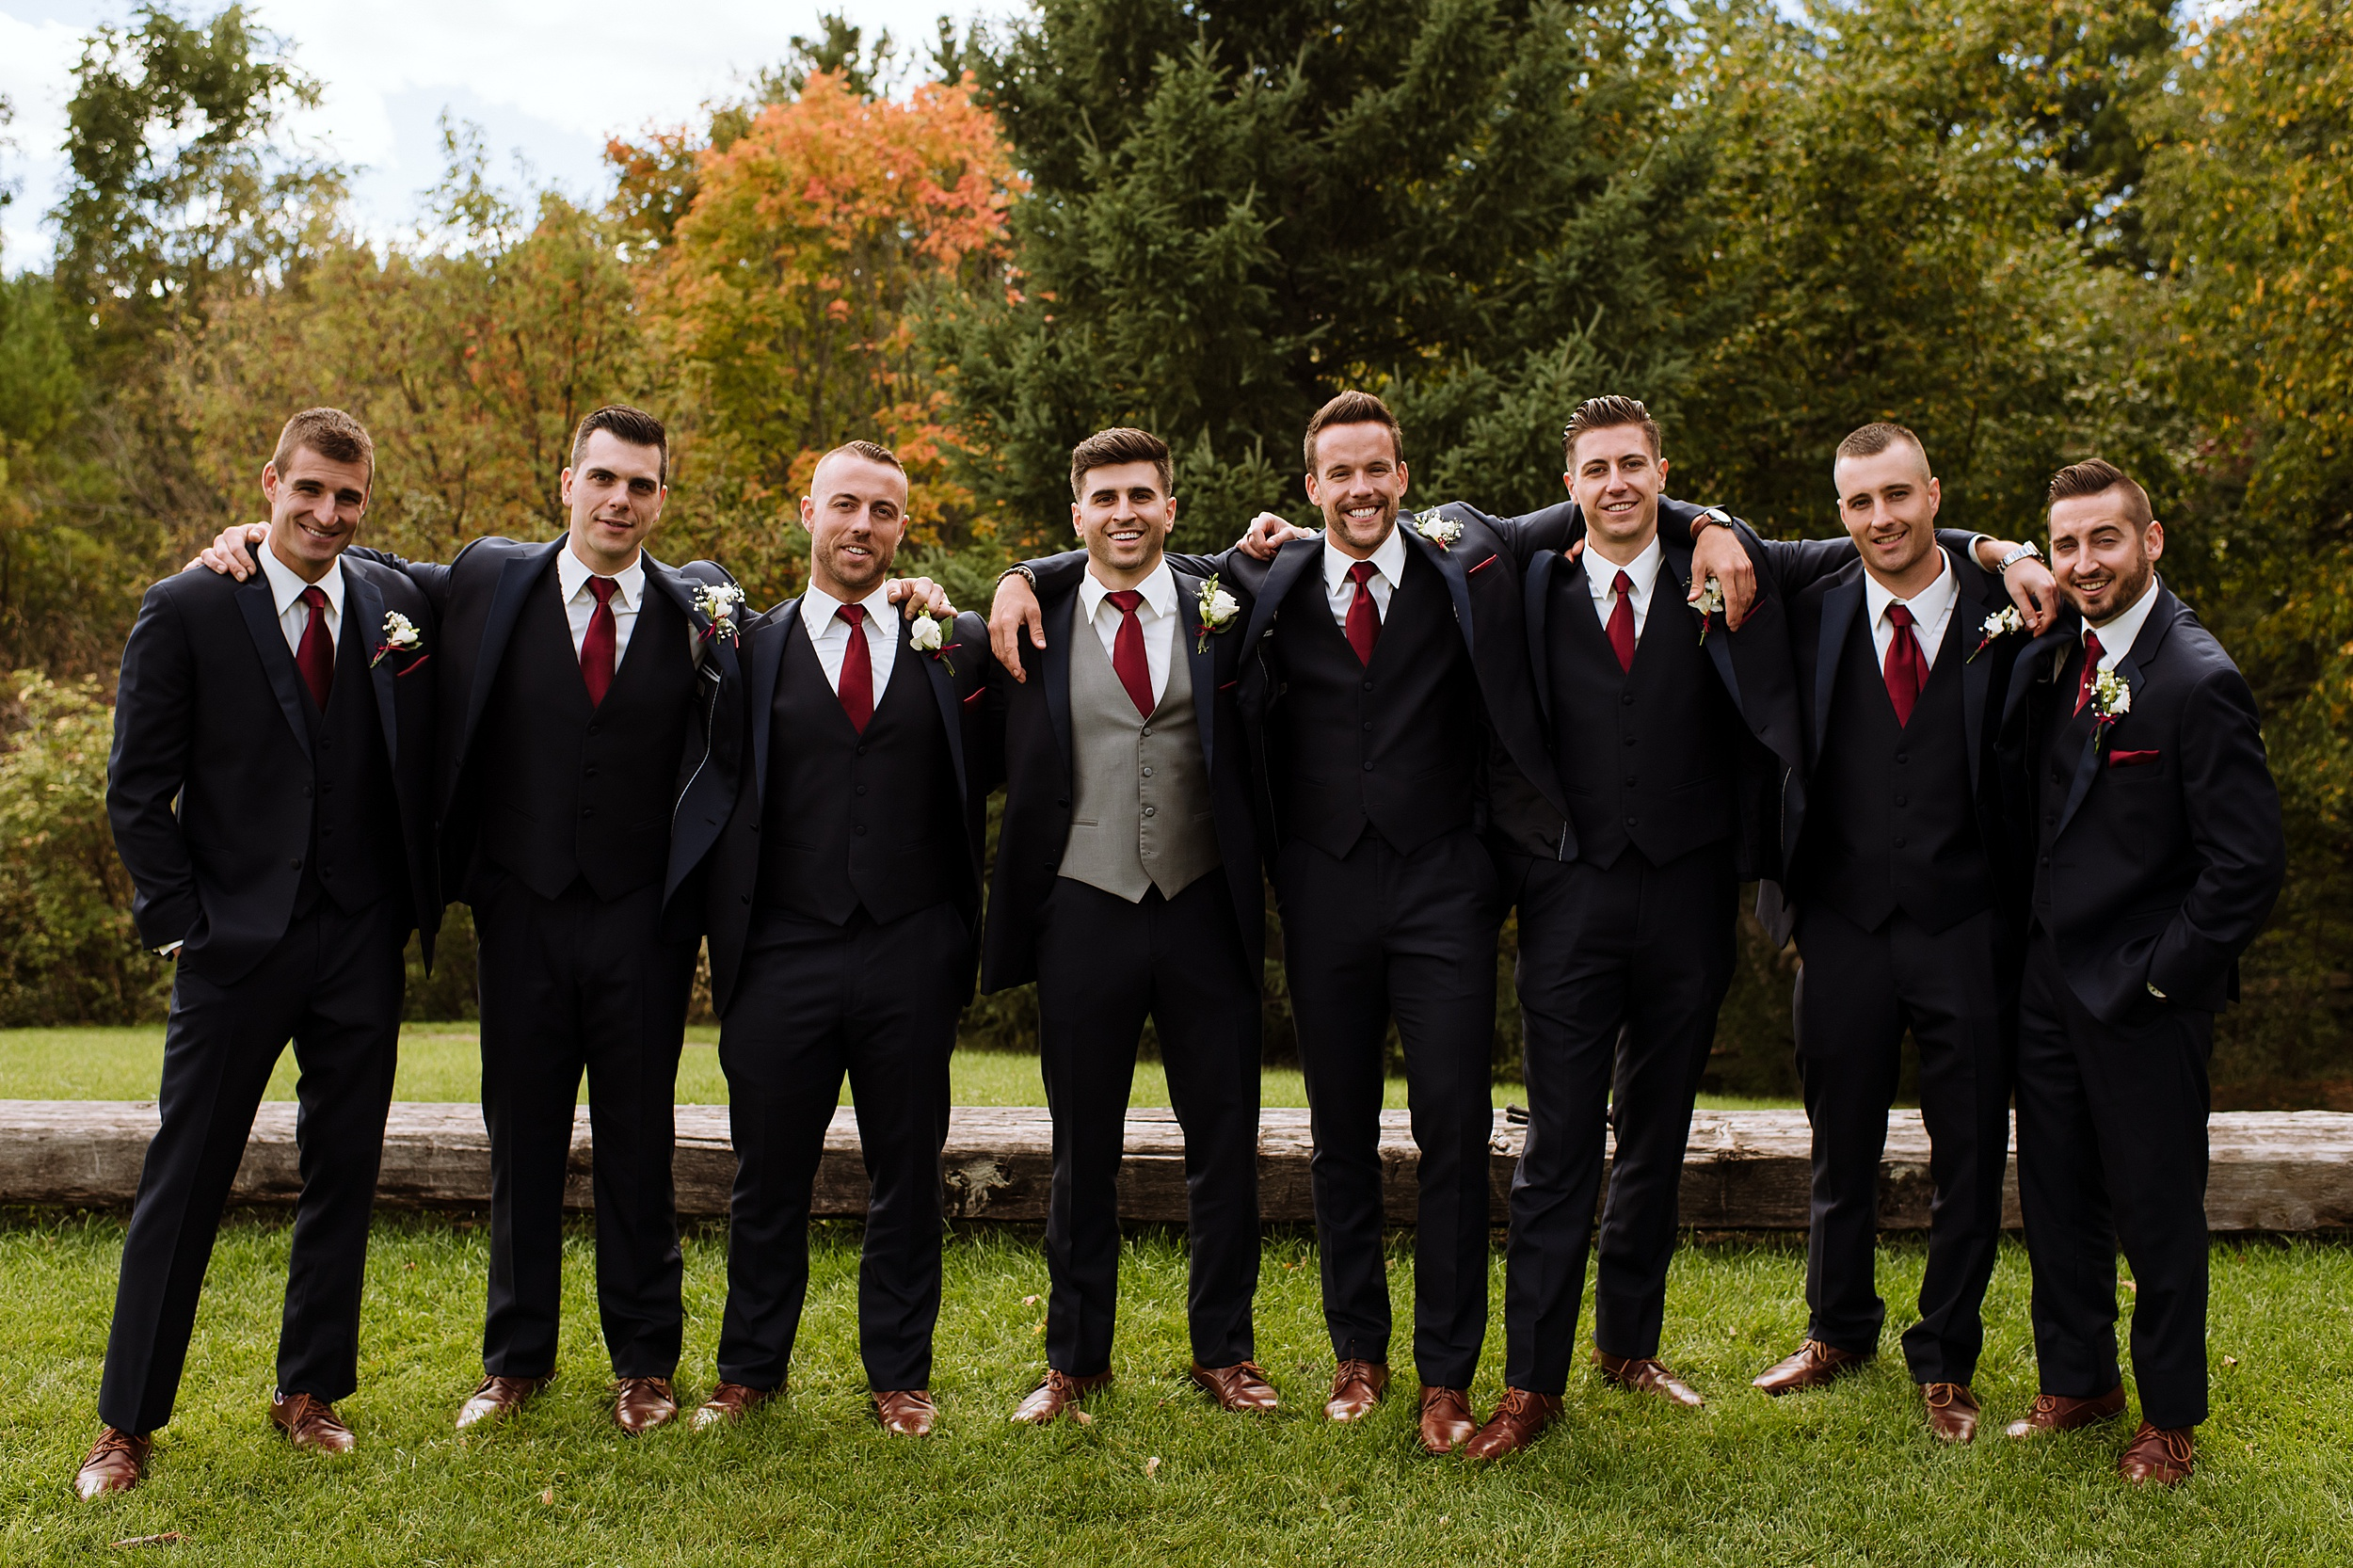 McMichael_Art_Collection_Wedding_chateau_le_jardin_Justine_Munro_Toronto_Photographer026.jpg